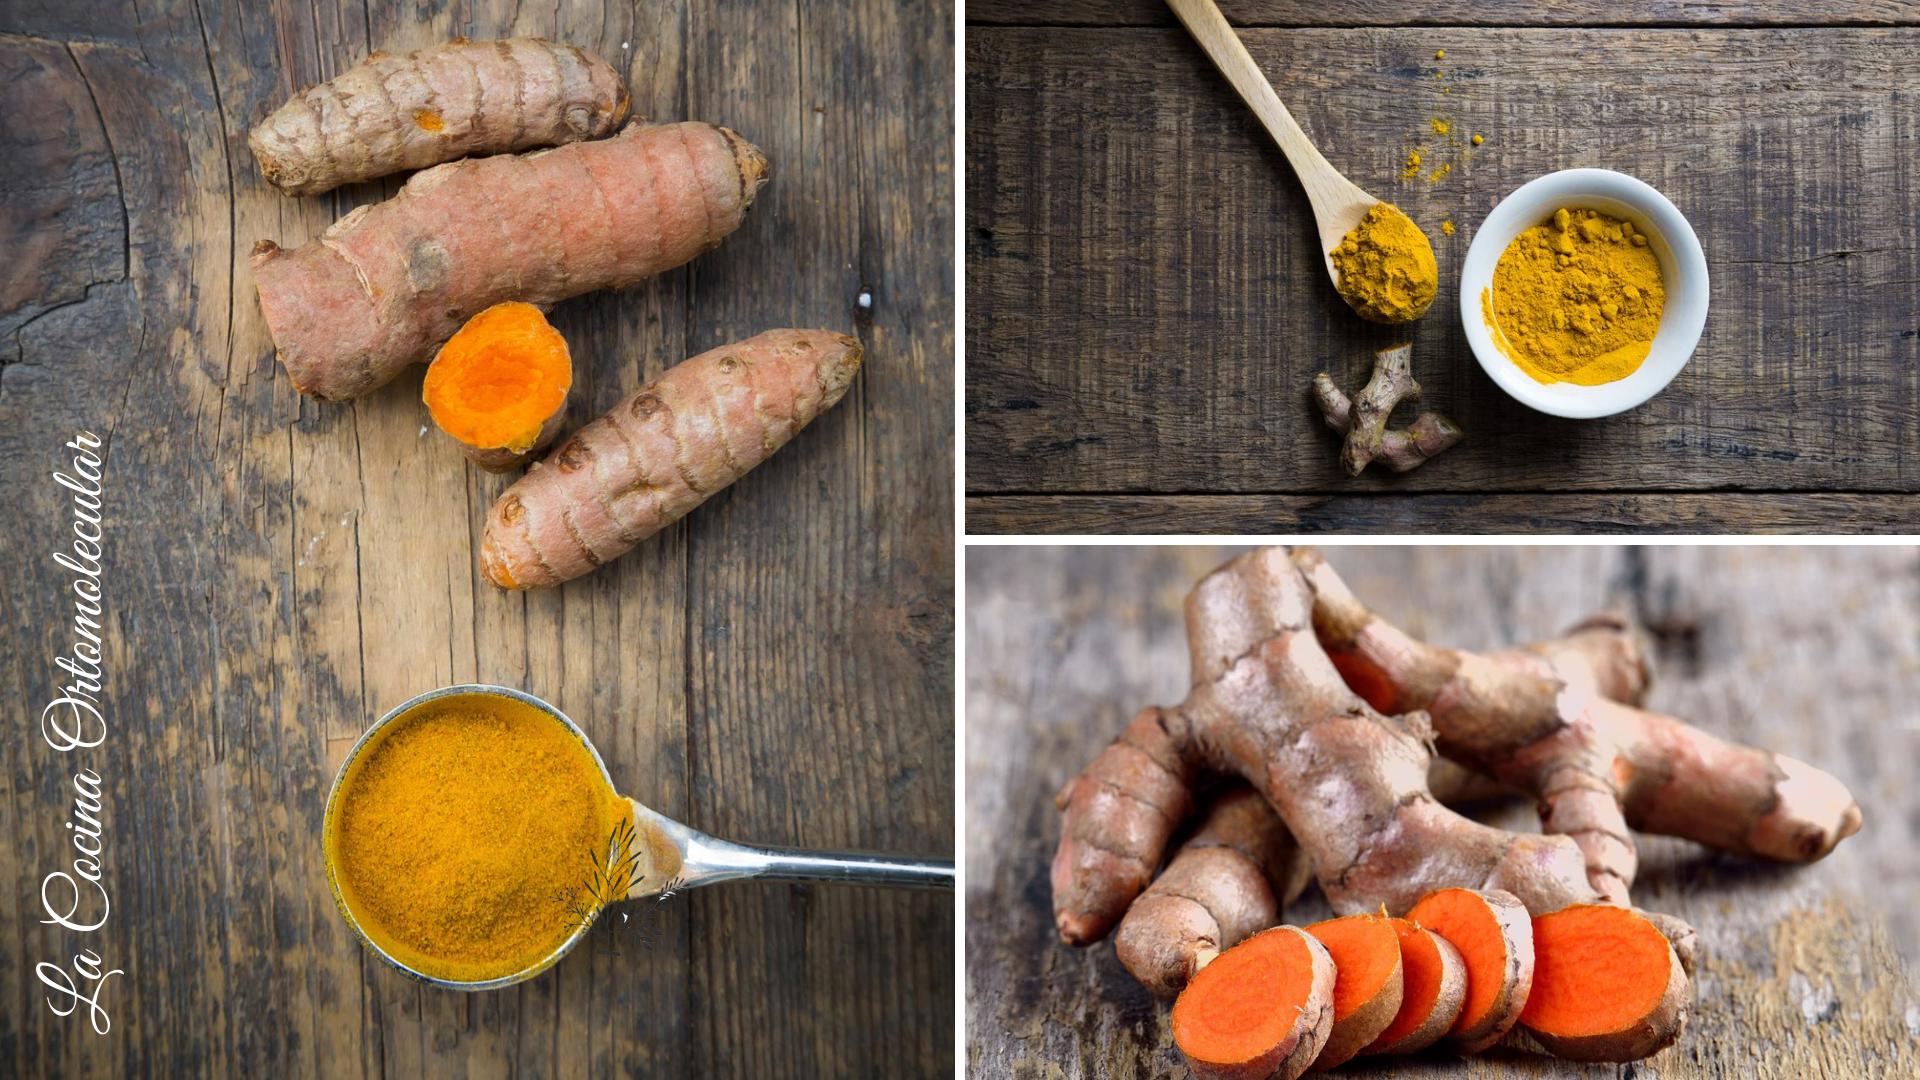 La cúrcuma puede influir sobre la microbiota intestinal